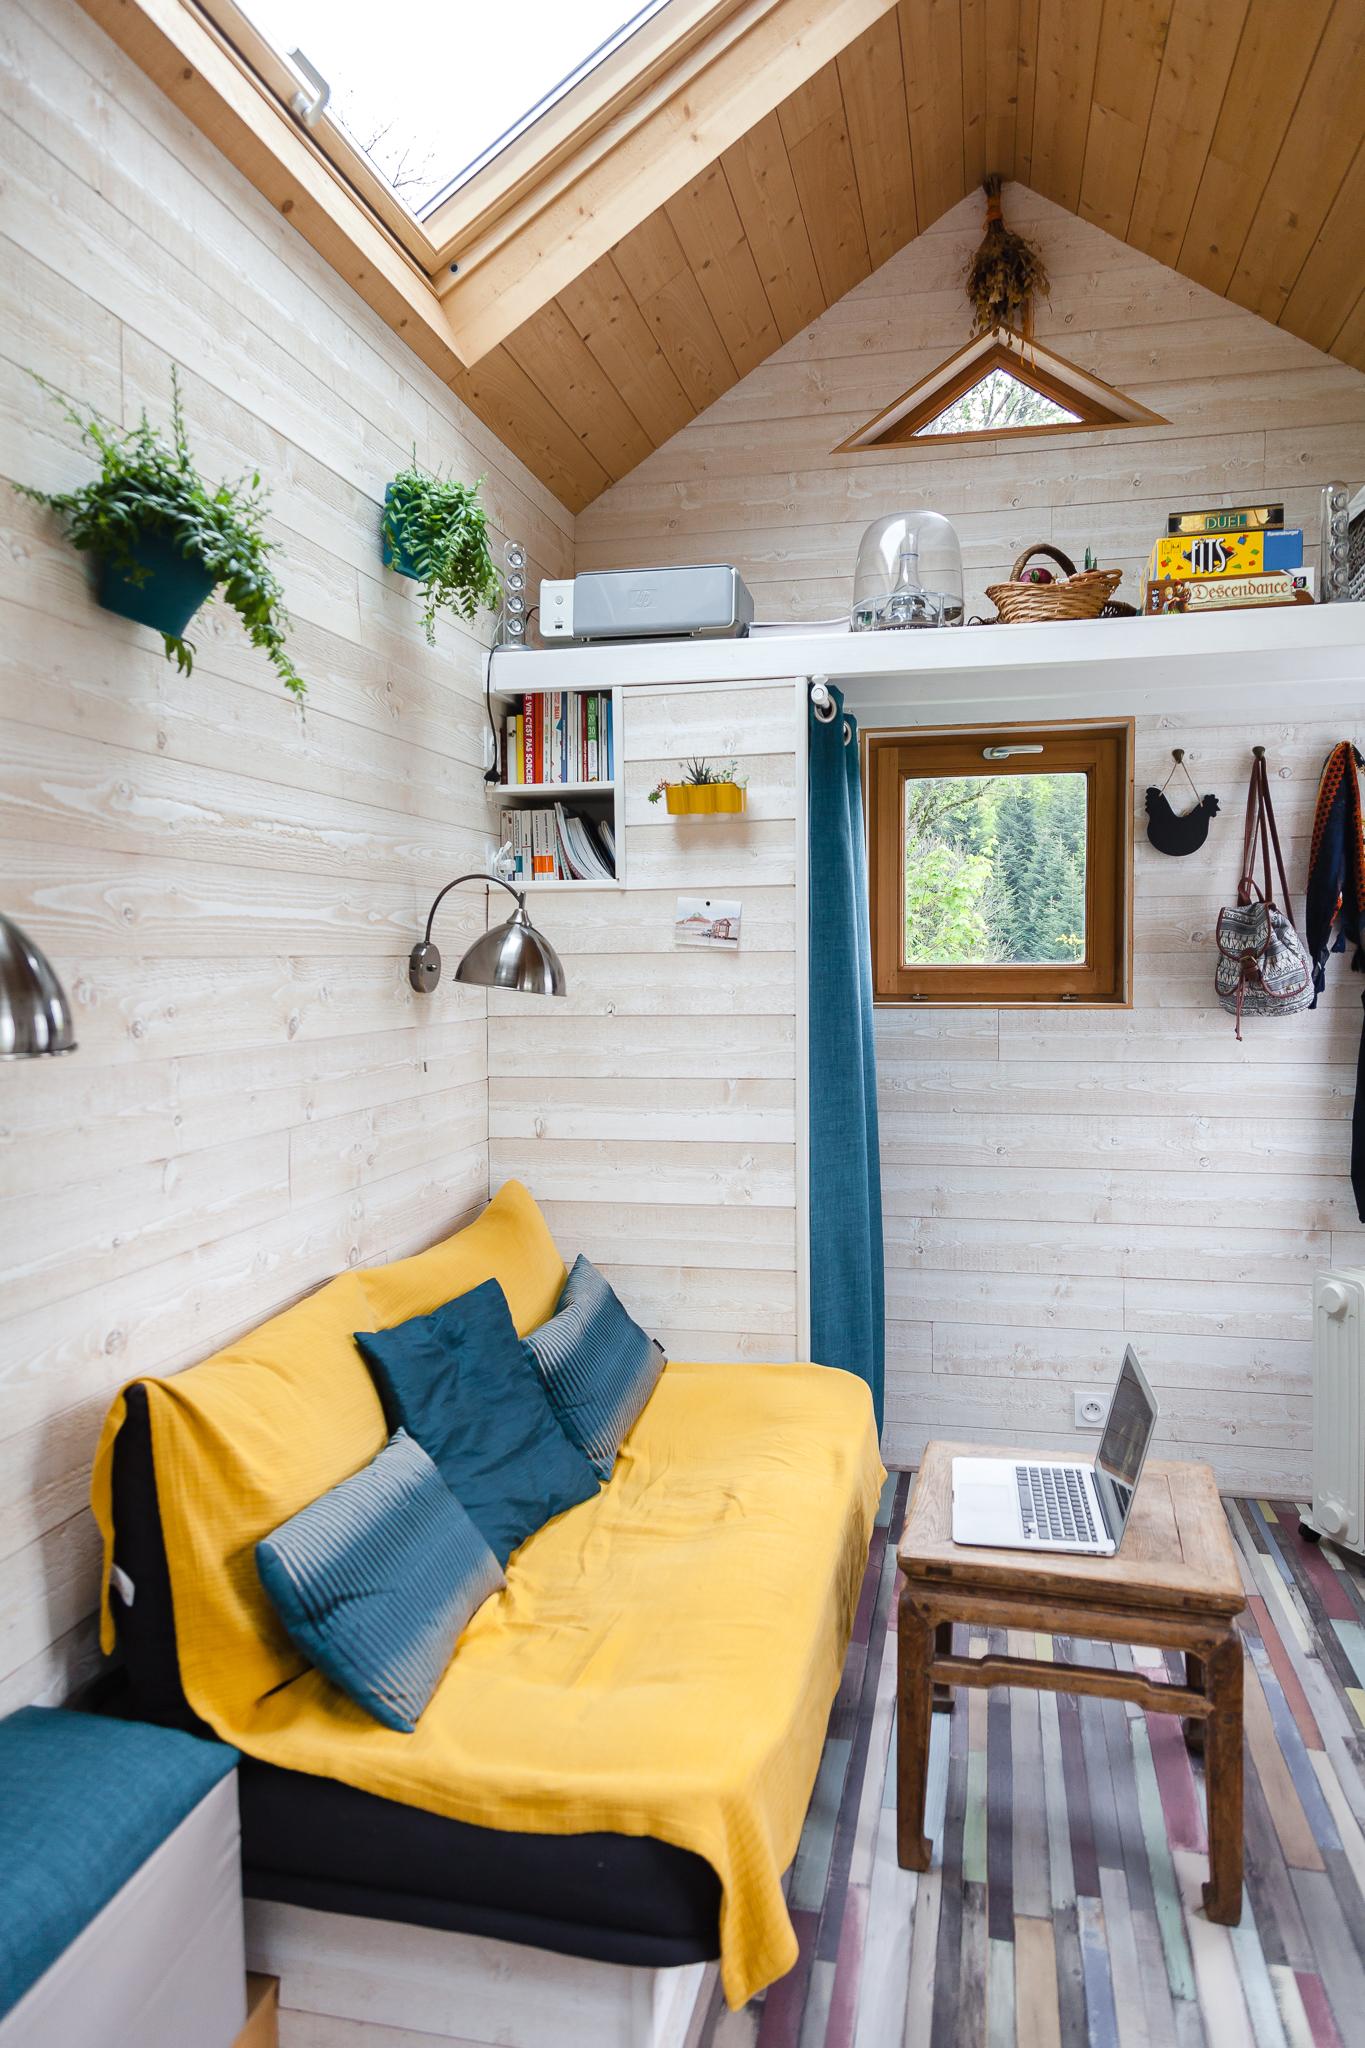 vendue tiny house d 39 occasion en savoie collectif tiny house. Black Bedroom Furniture Sets. Home Design Ideas